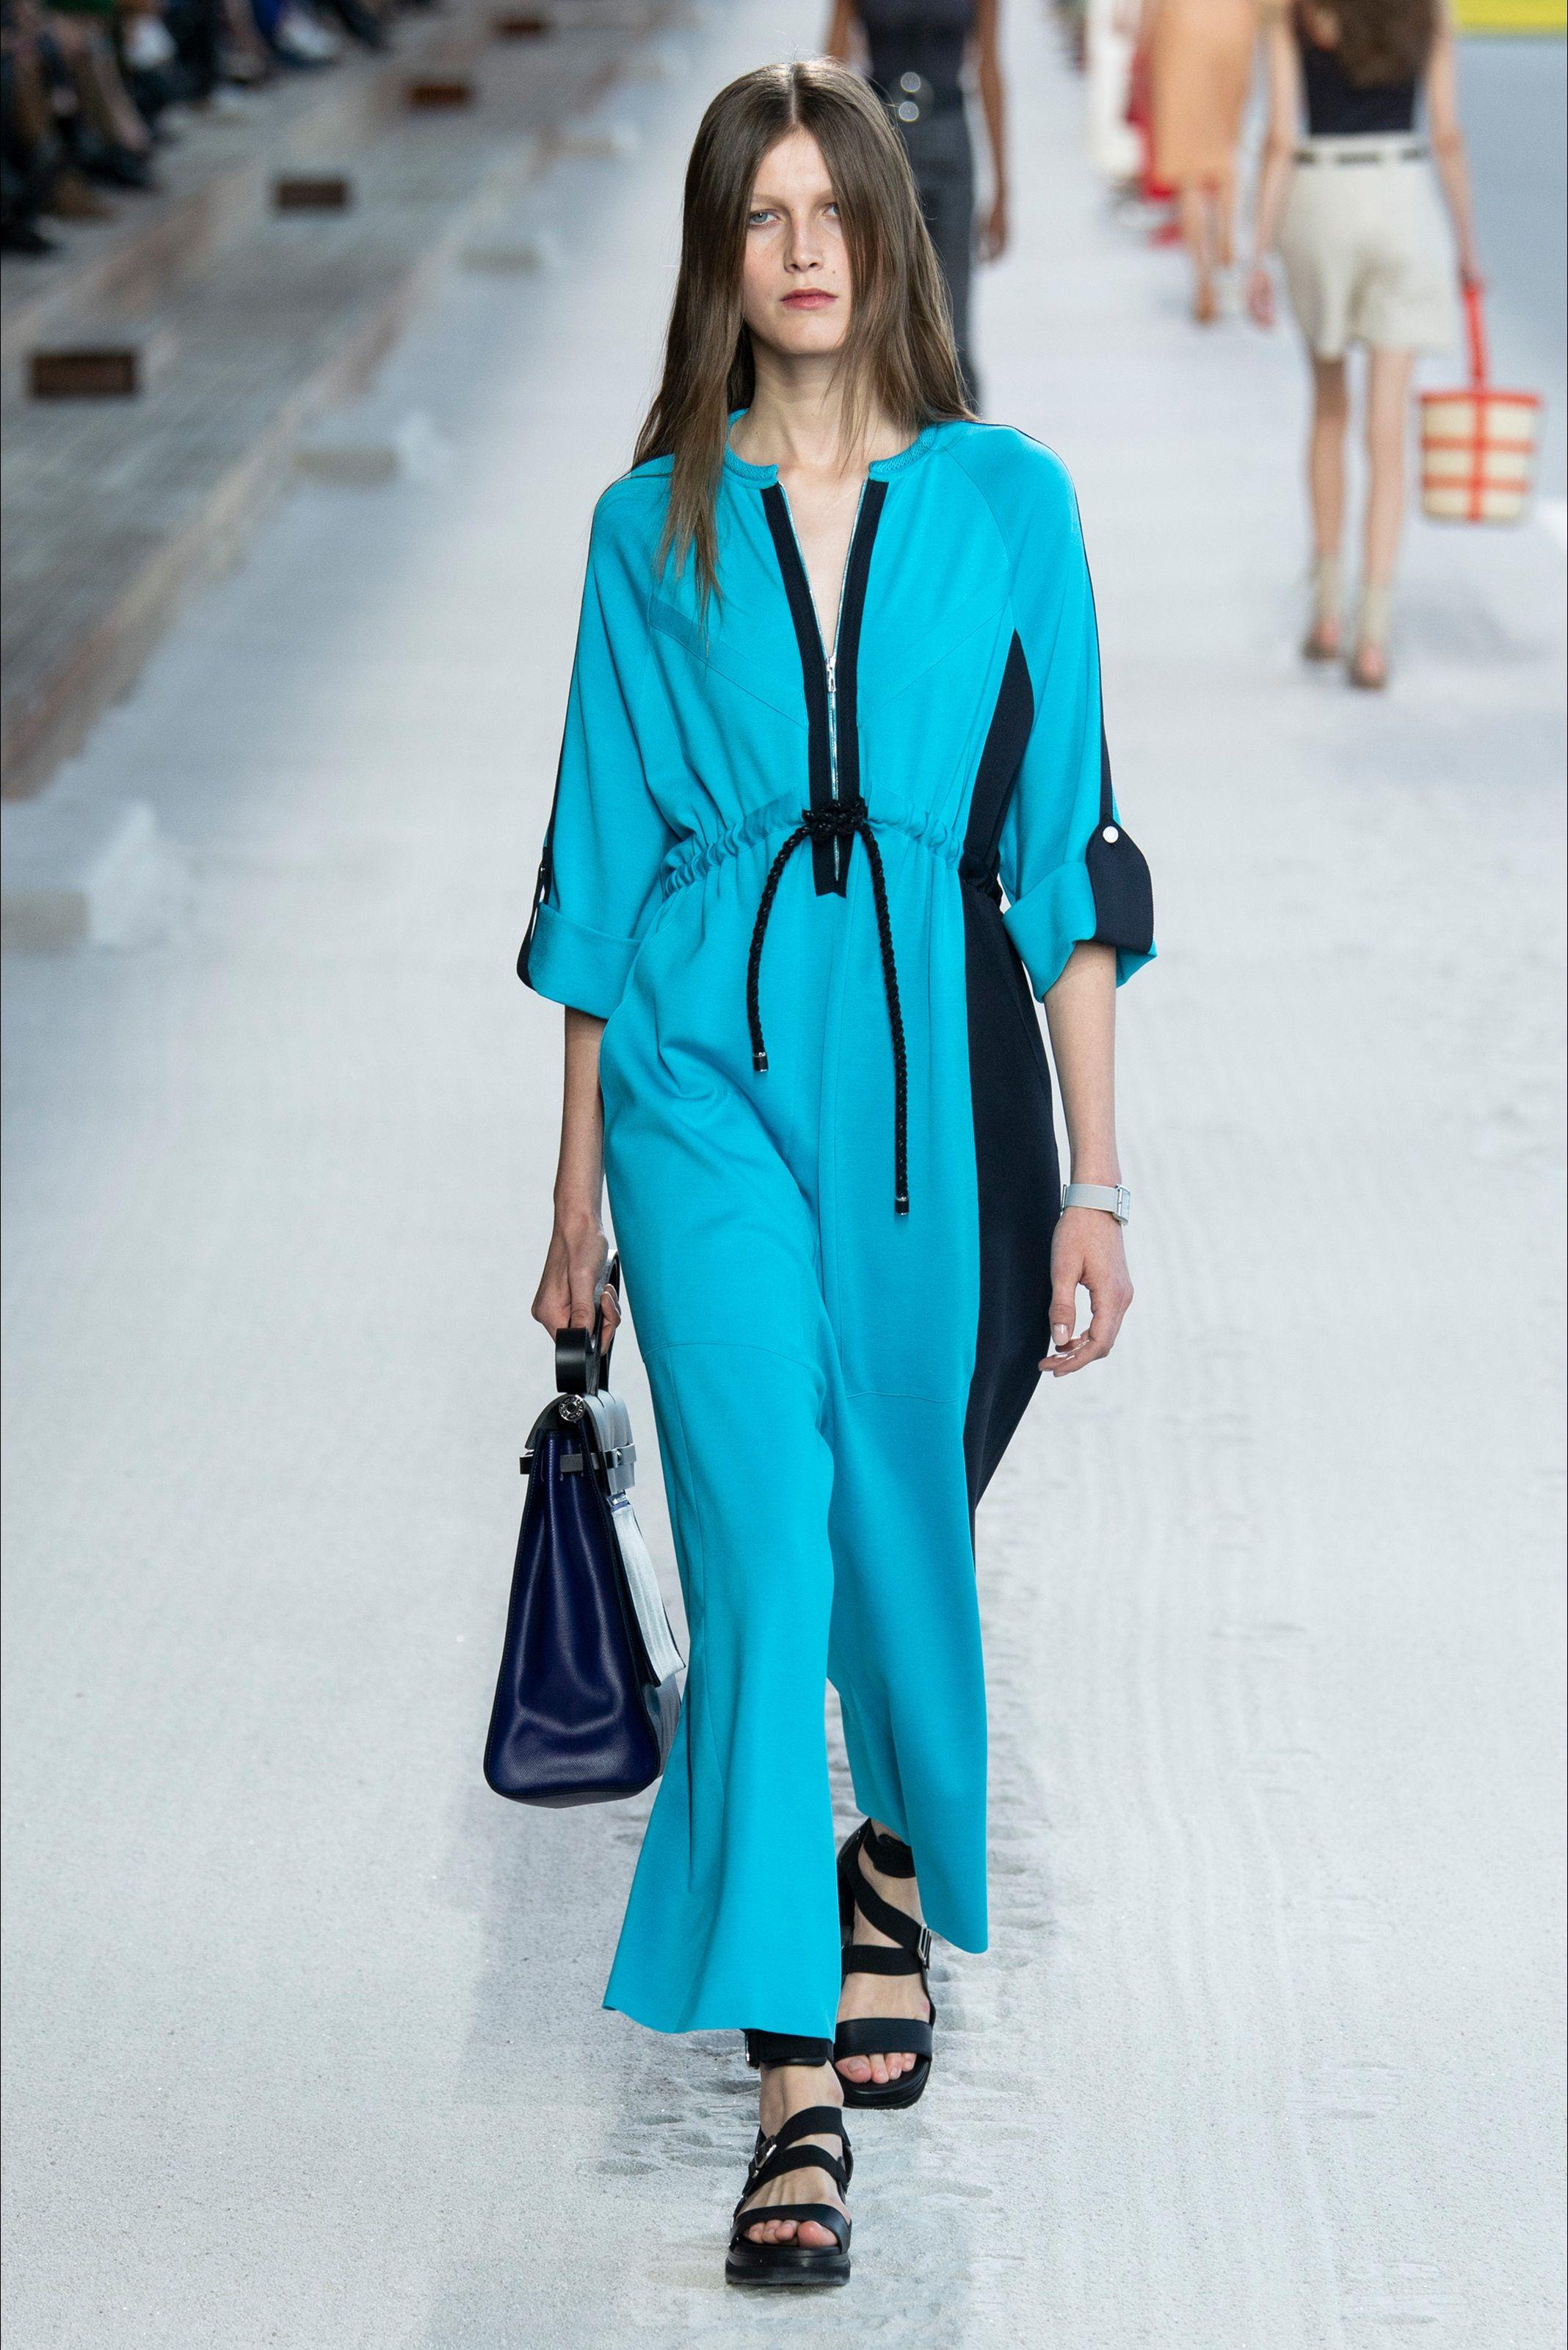 0913ceffb91 Sfilata Hermès Parigi - Collezioni Primavera Estate 2019 - Vogue ...